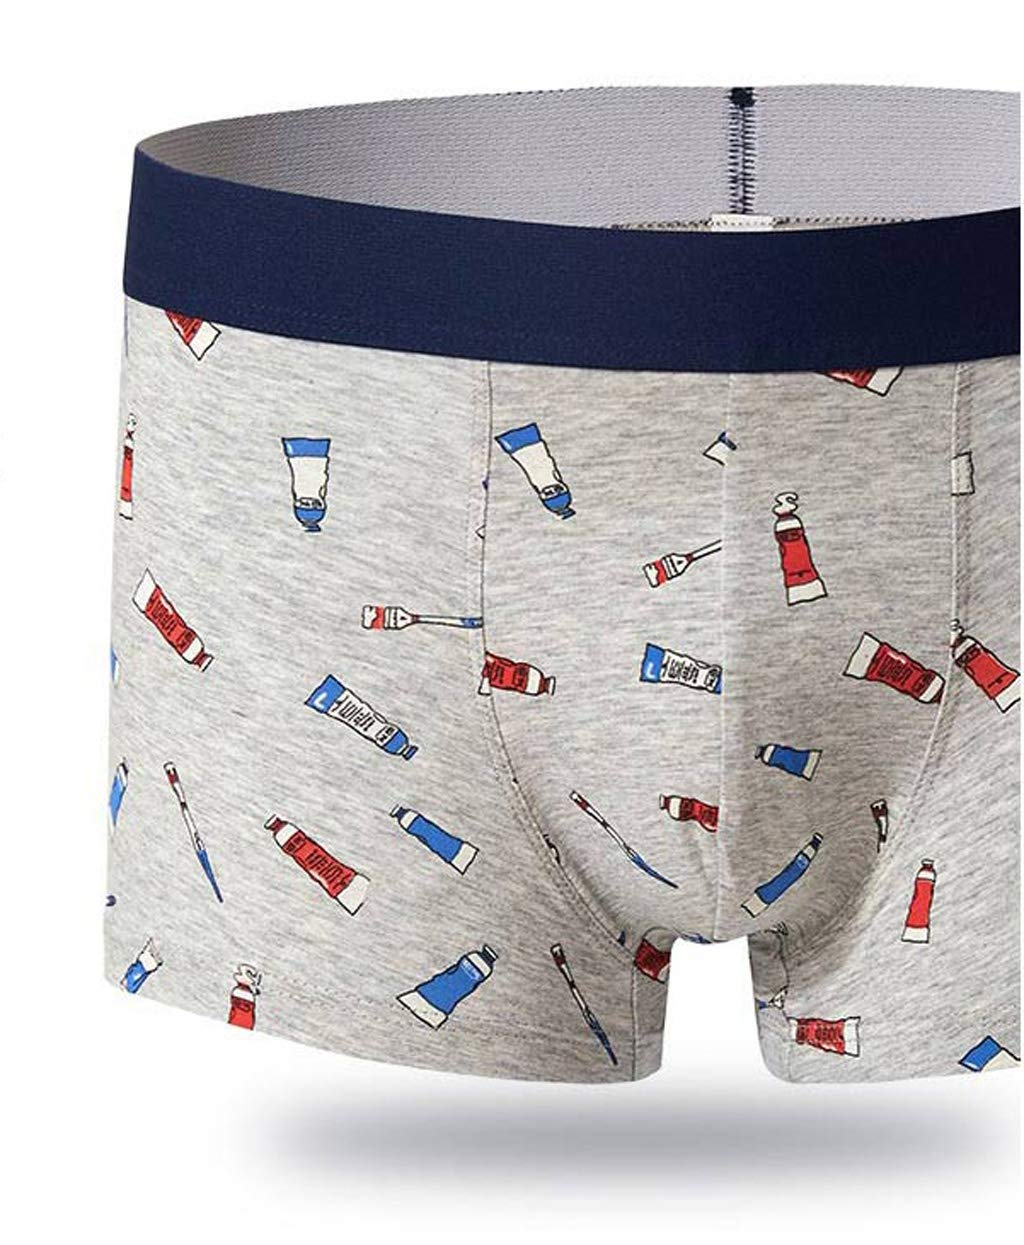 ST apparel Ropa Interior de Hombre de algodón de Dibujos Animados Boxeadores Transpirables Ropa Interior de Hombre Joven Pantalones japoneses de Cintura ...